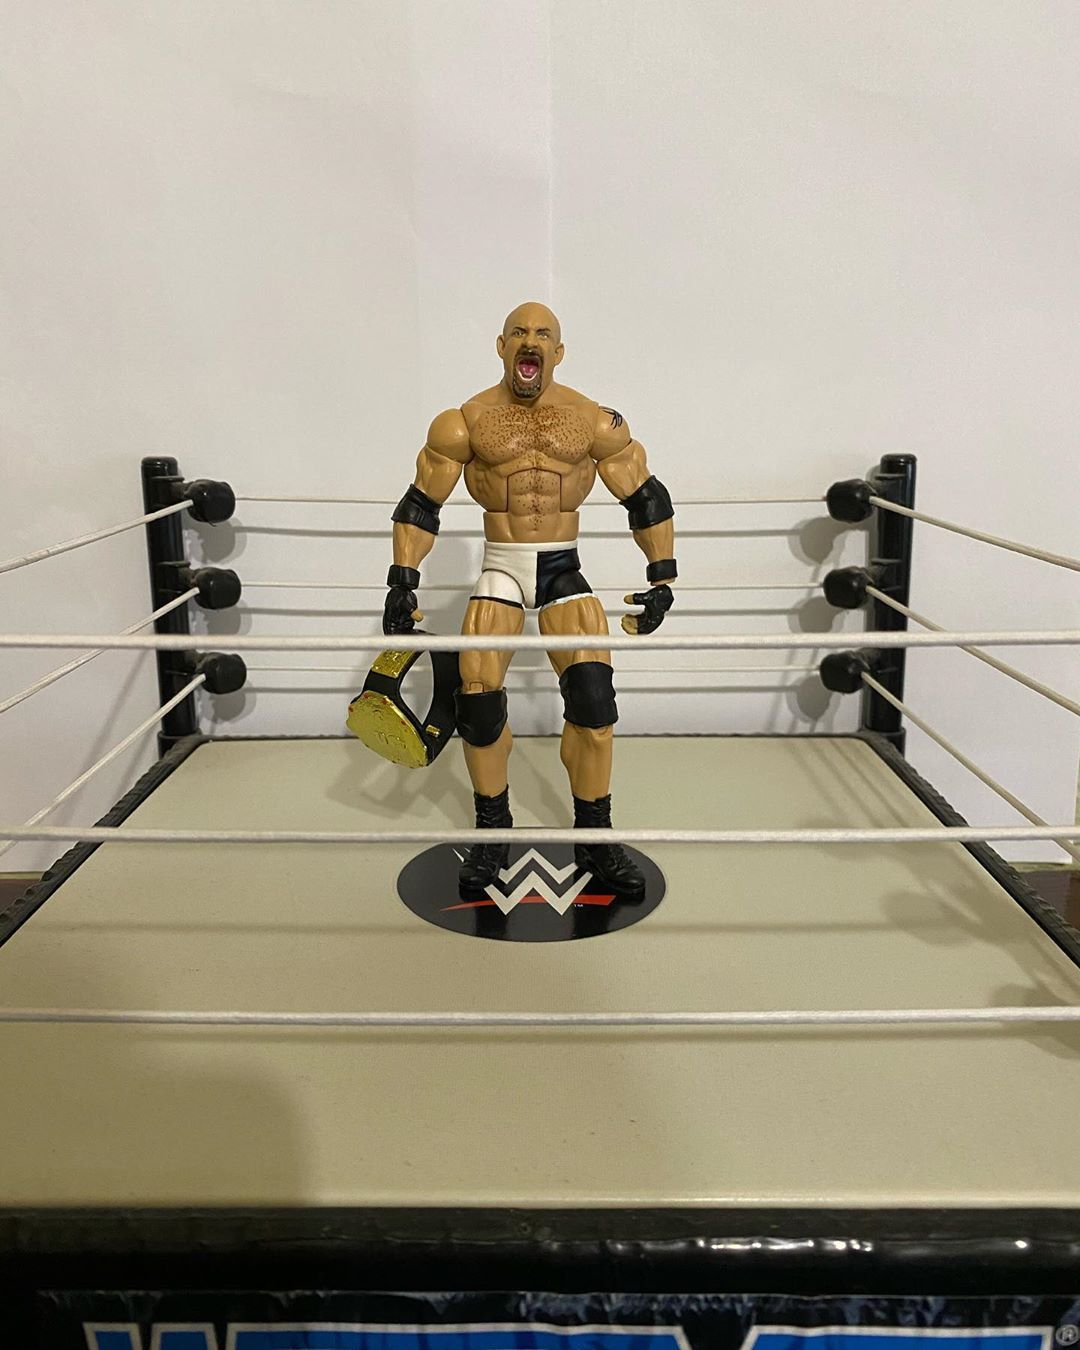 ❓WHOS NEXT ❓ Elite 74 Goldberg depicts his 2003 World Heavyweight championship run! • •  #actionfigures #toys #toyphotography #actionfigurephotography #actionfigure #toycollector #toystagram #marvel #toy #toycommunity #hasbro #toyartistry #starwars #marvellegends #bandai #wrestling #wwe #prowrestling #mma #bjj #ufc #jiujitsu #boxing #grappling #nxt #raw #aew #muaythai #kickboxing #fitness